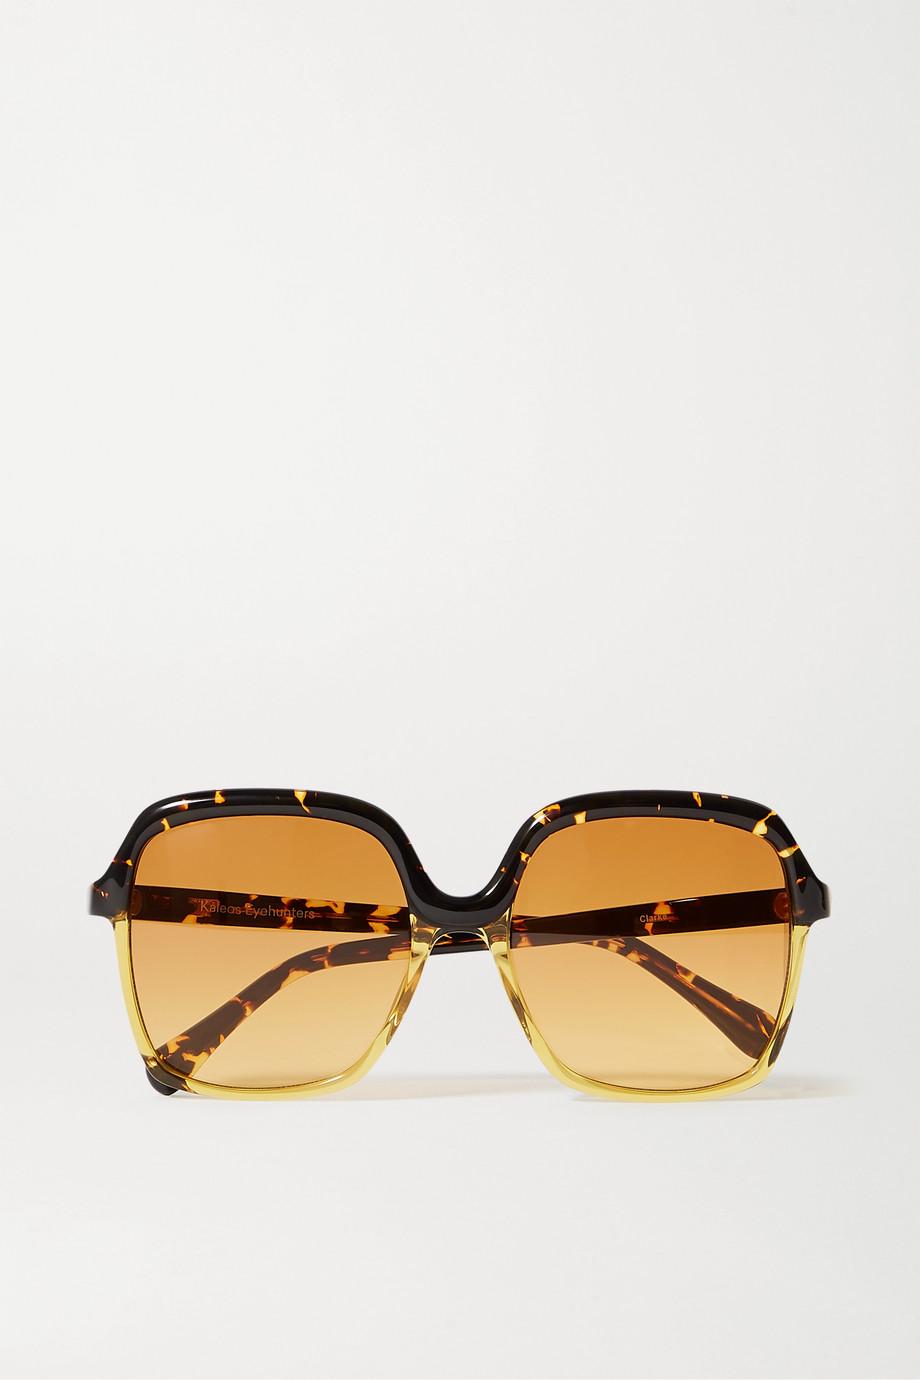 Kaleos Clarke oversized square-frame tortoiseshell acetate sunglasses